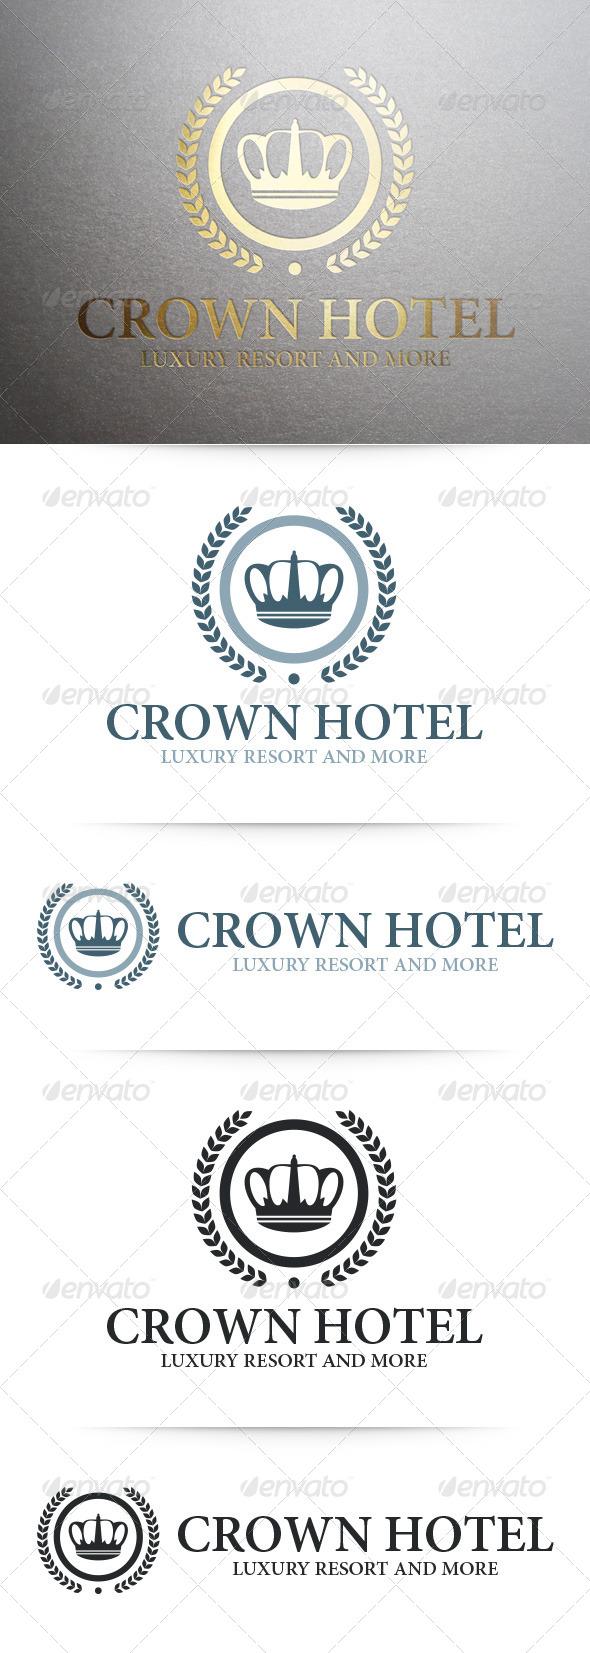 Crown Hotel Logo Template